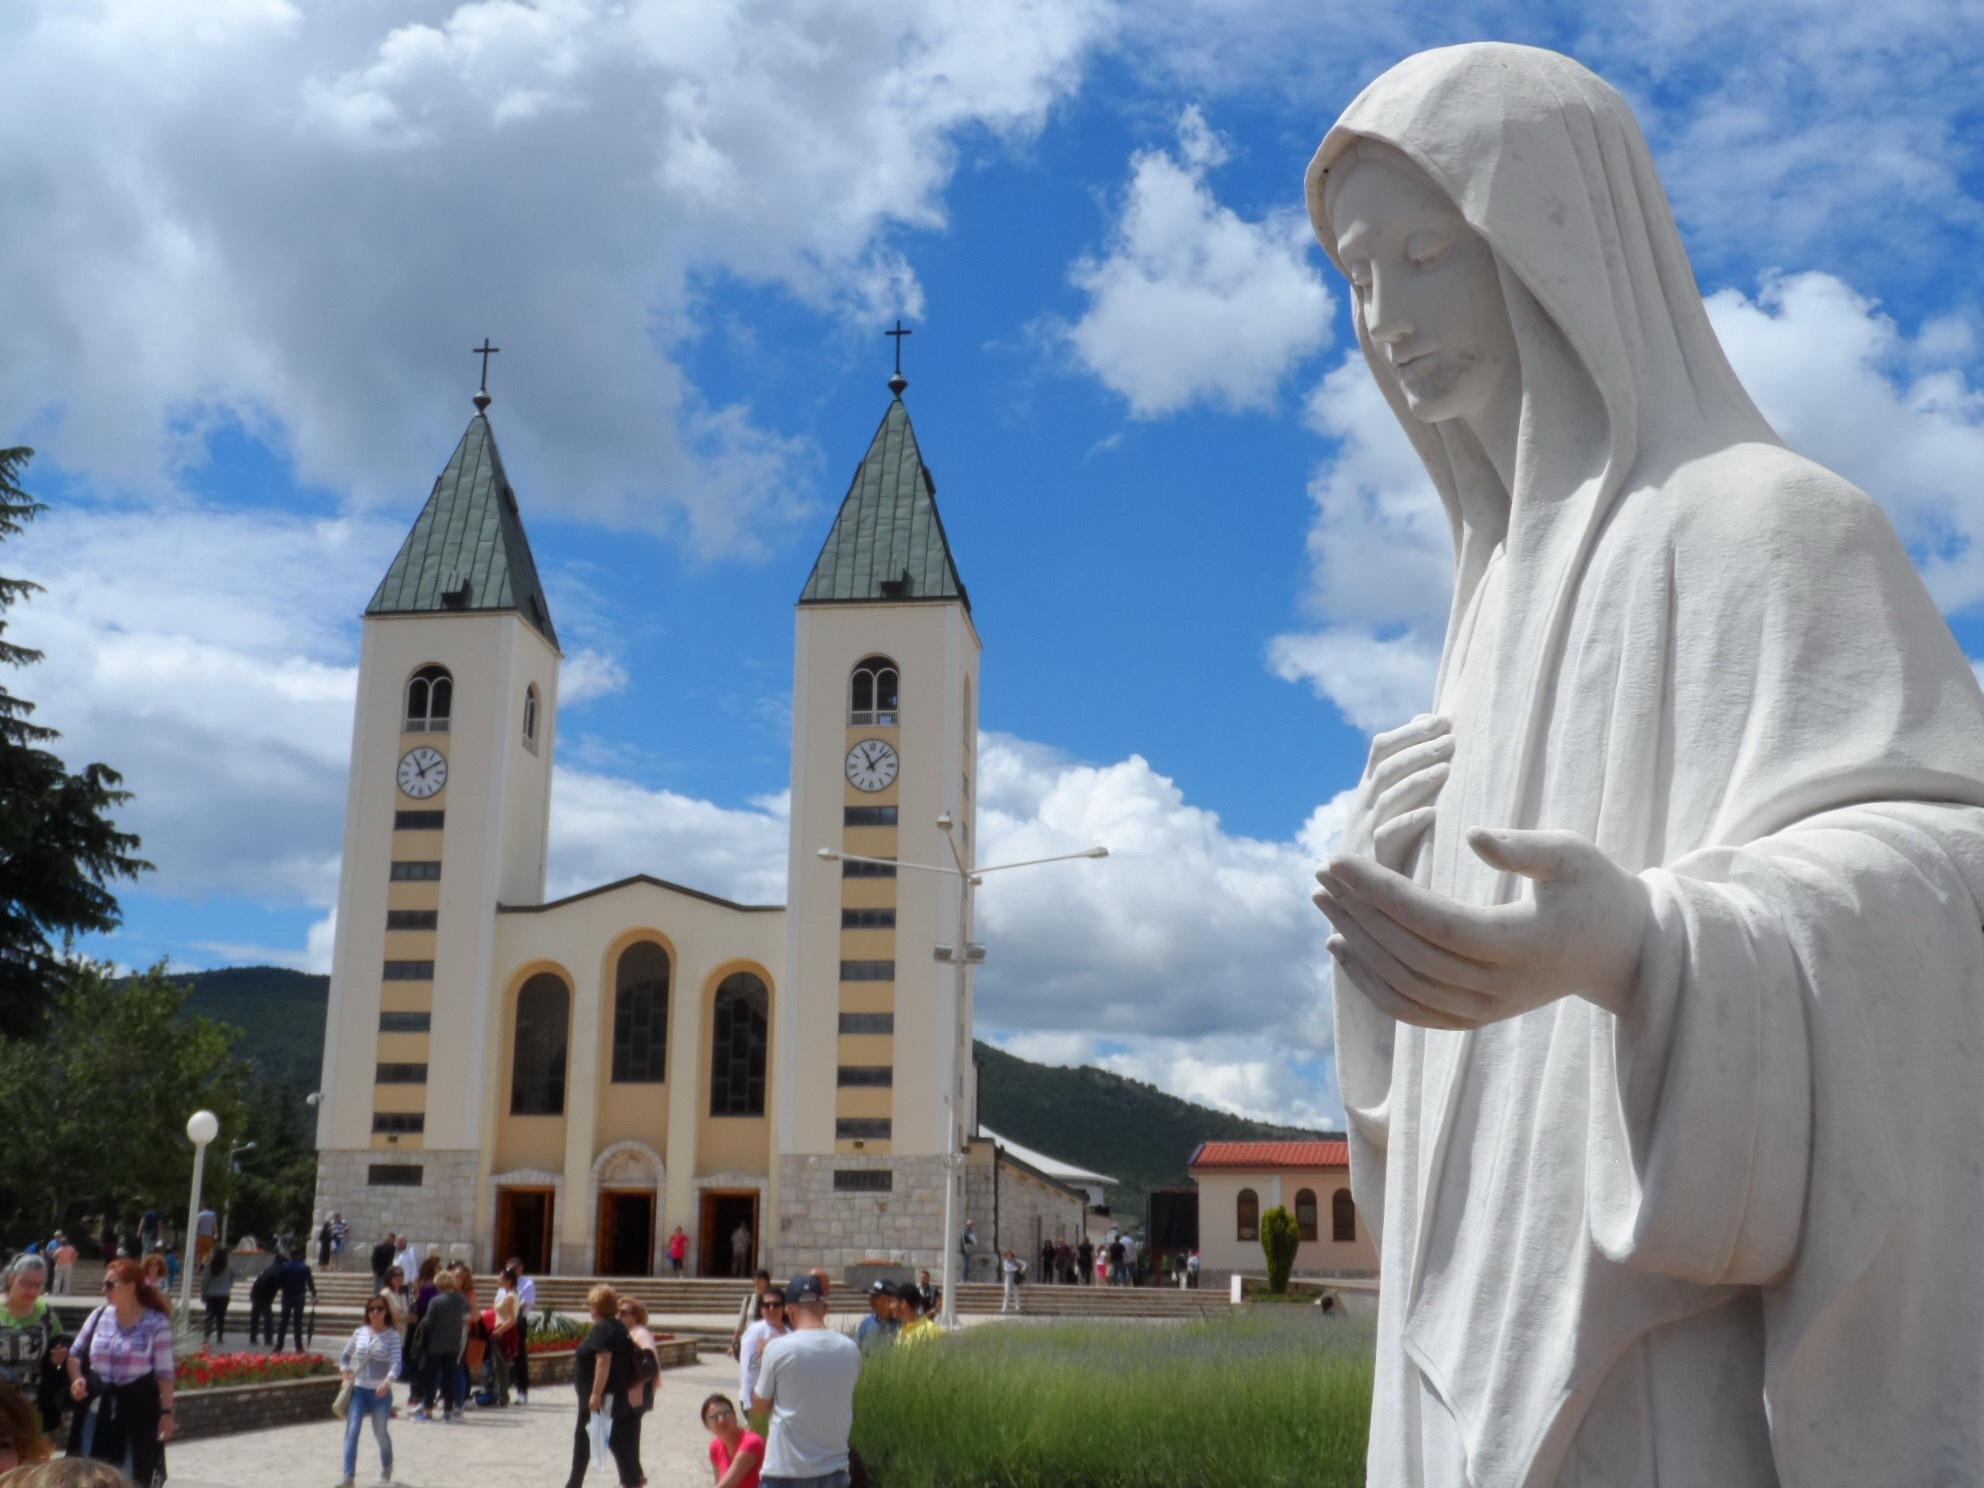 bosnia-erzegovina_m6js9.T0.jpg